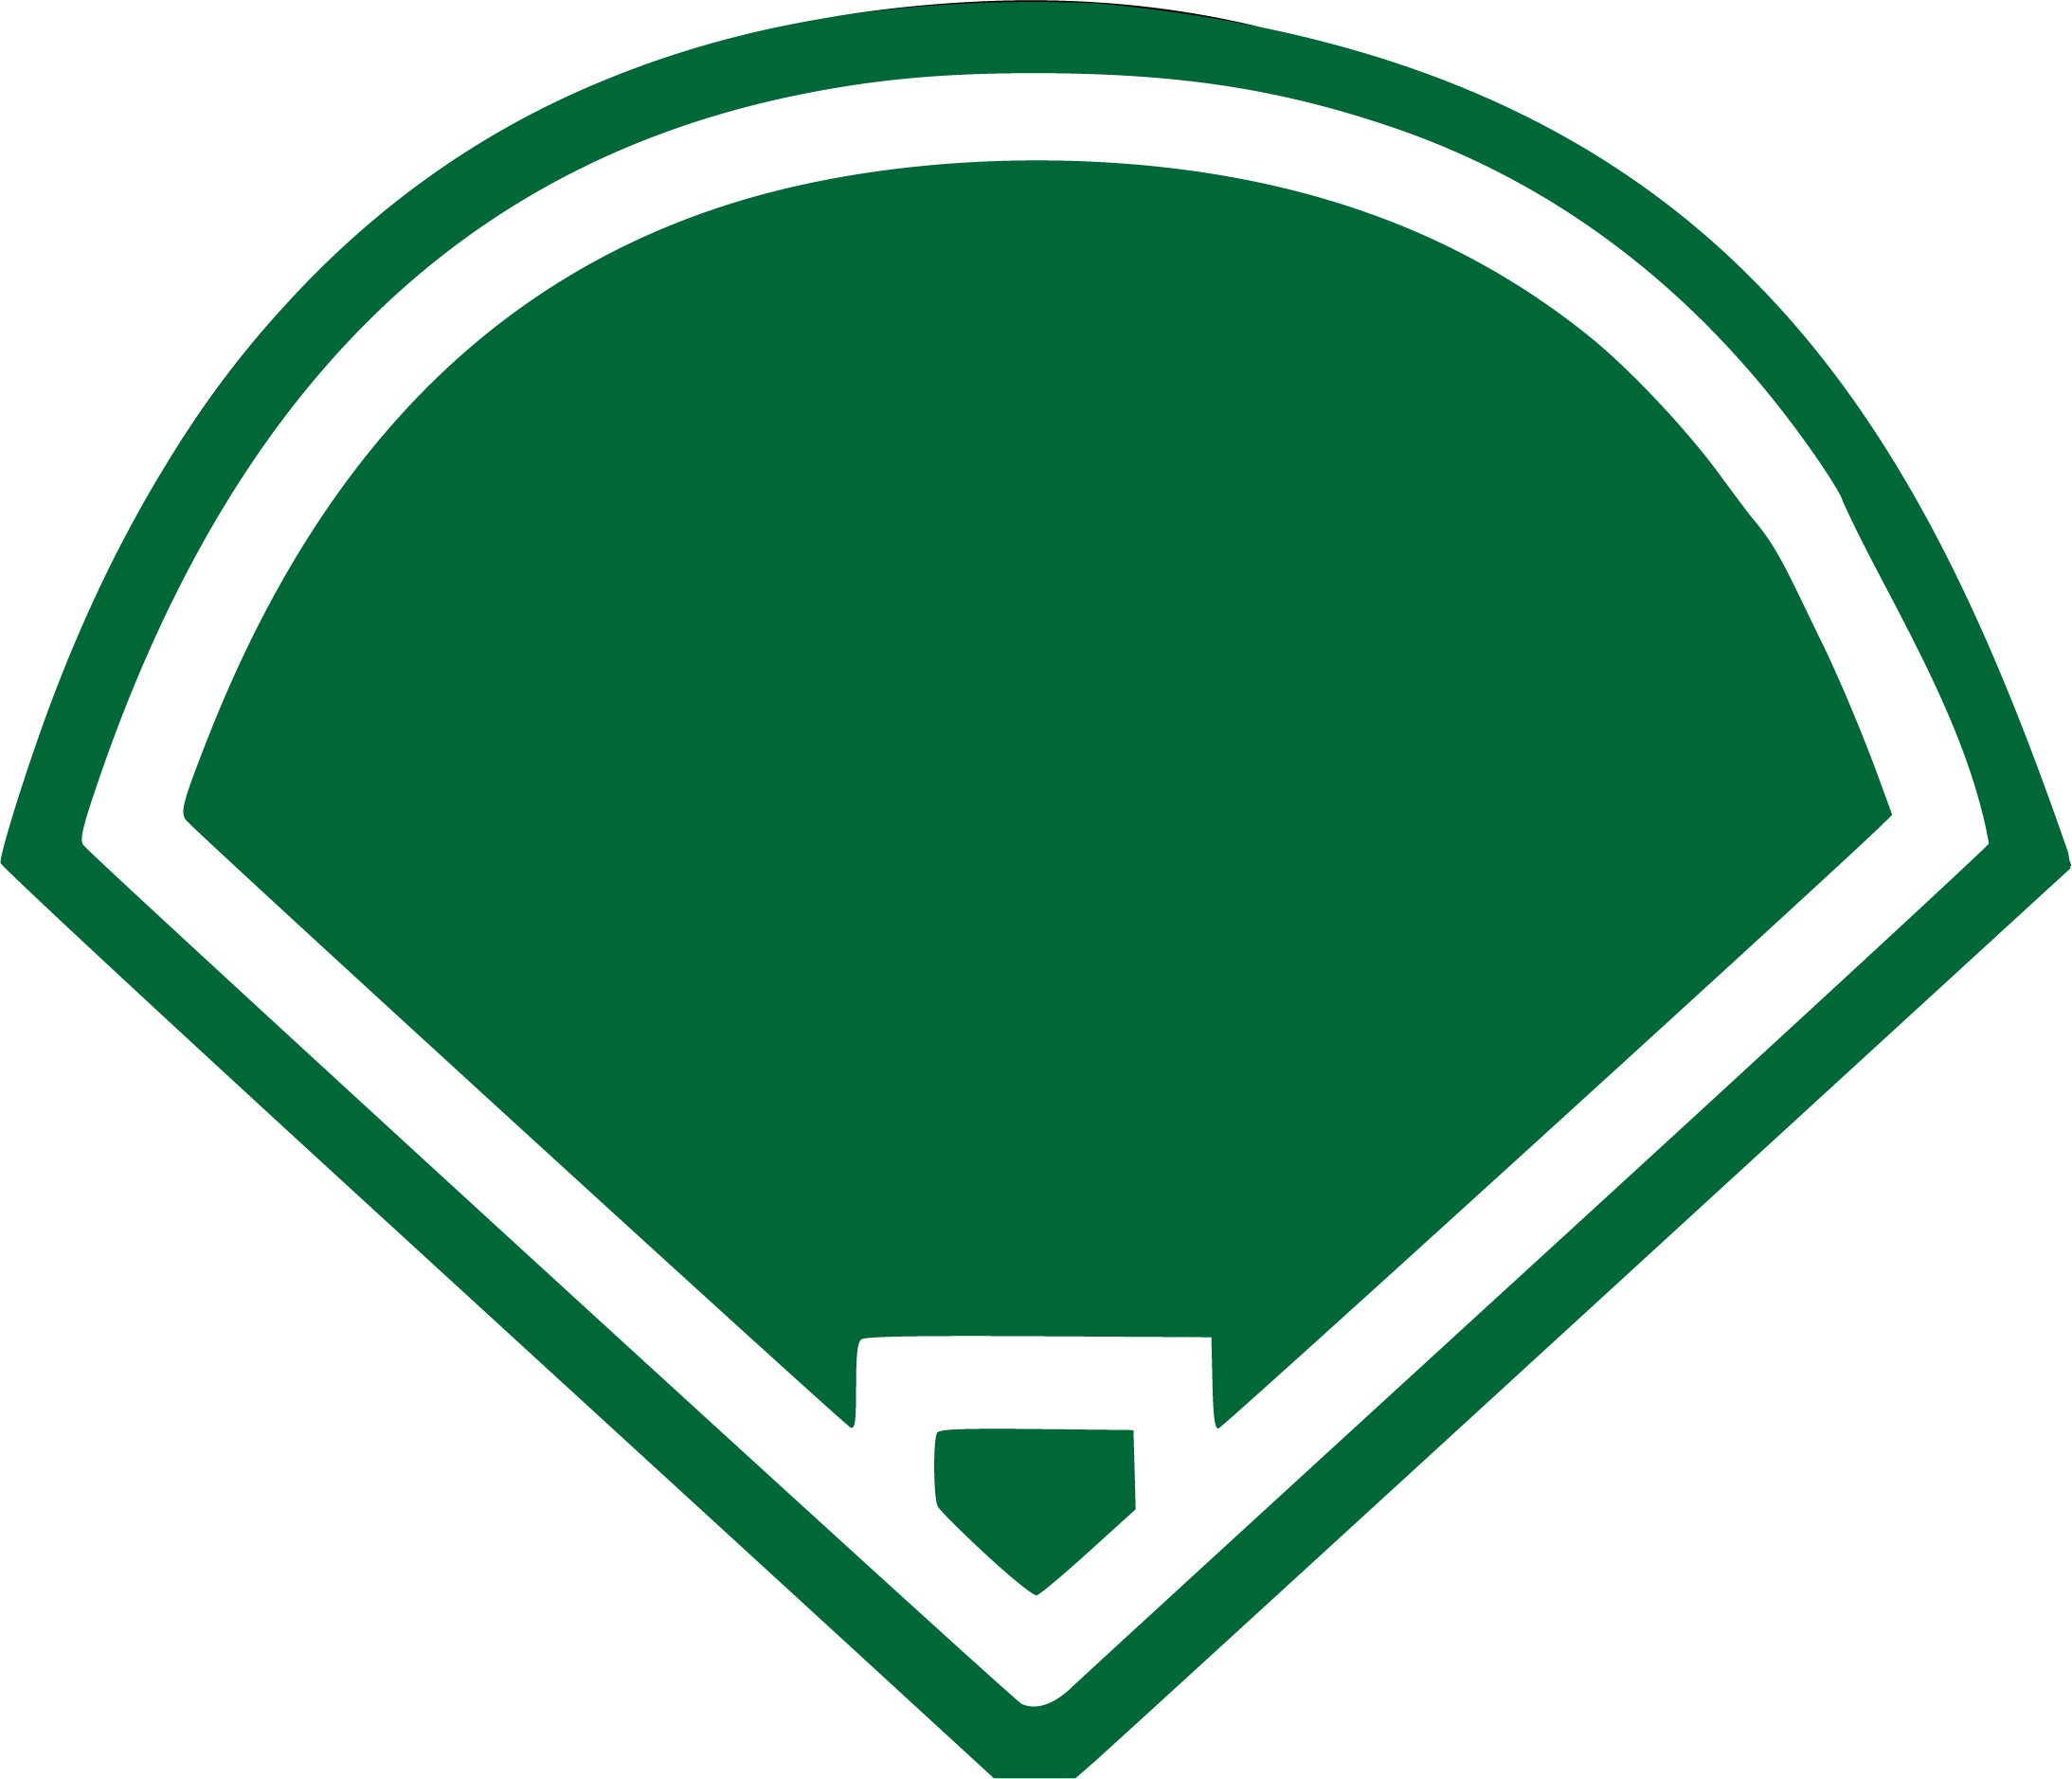 Campo verde de béisbol